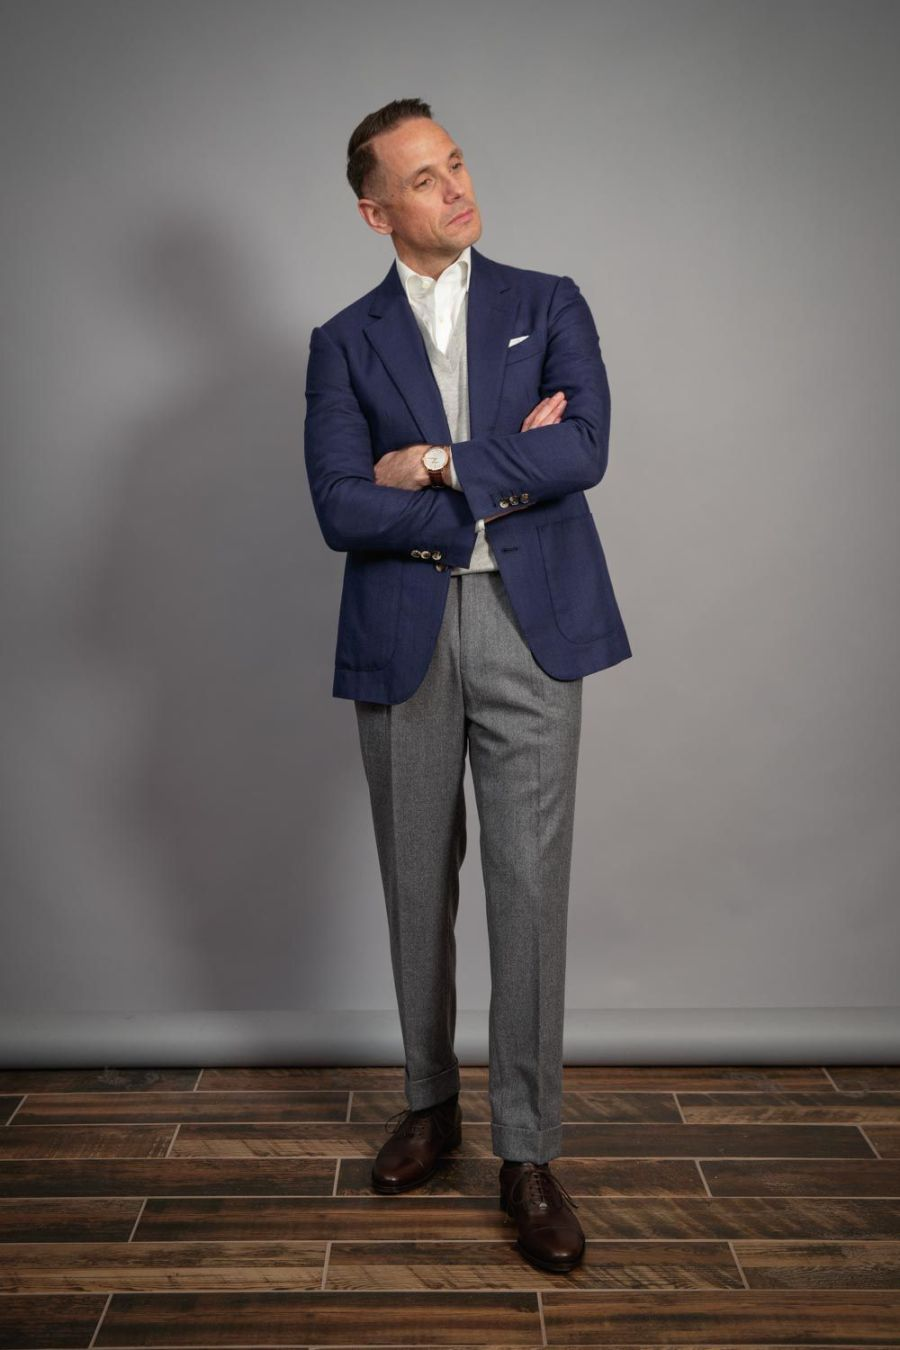 menswear-uniform-blue-blazer-grey-pants-brown-shoes-michael-andrews